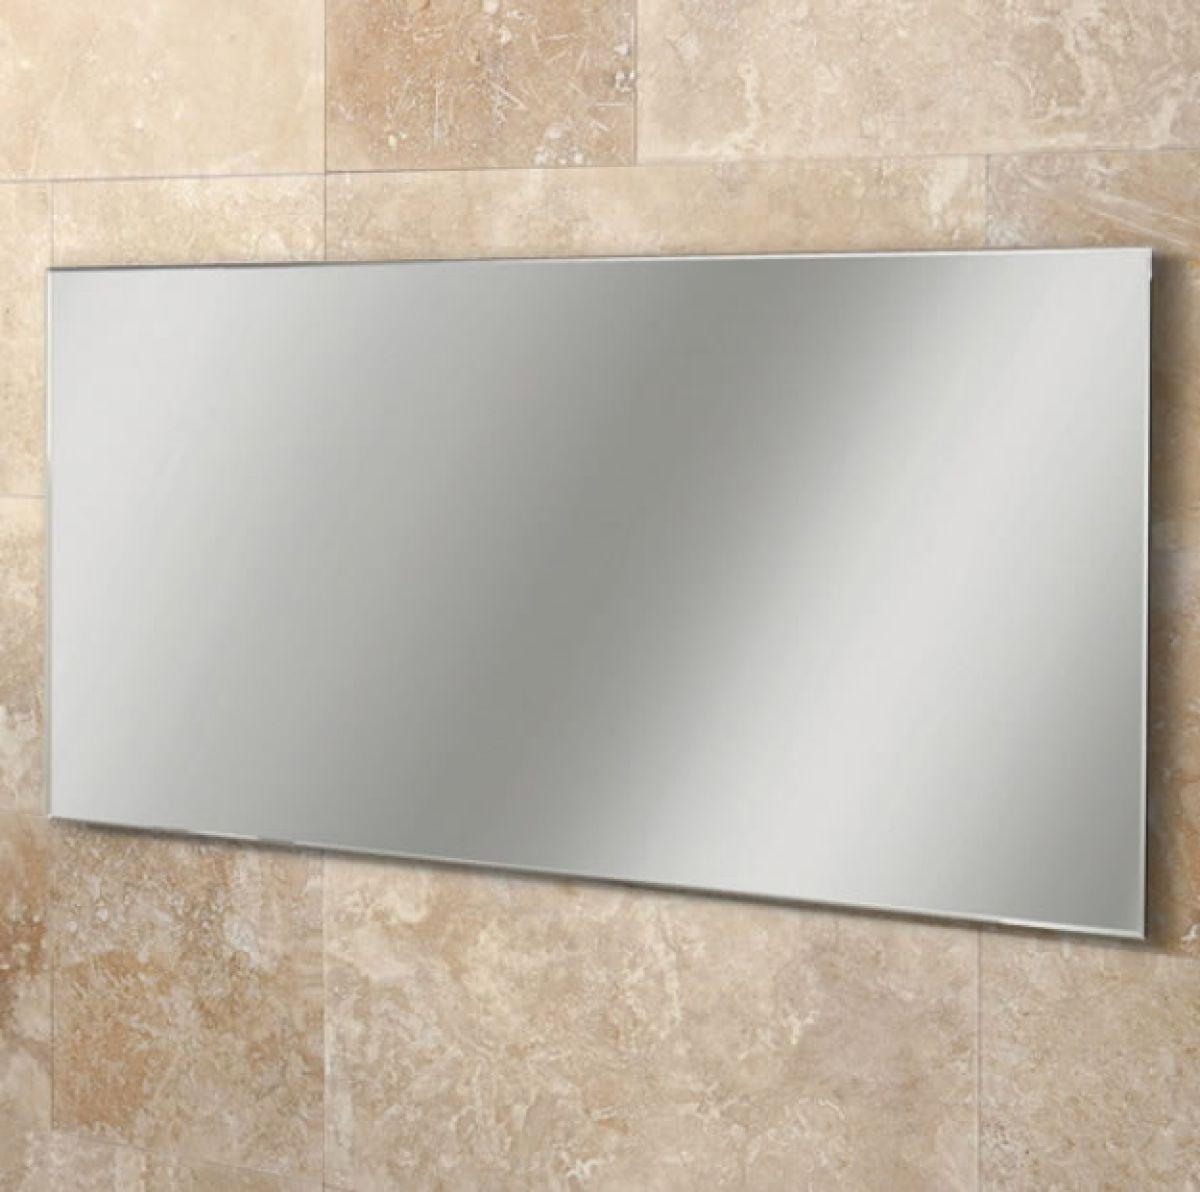 Hib willow large bathroom mirror uk bathrooms